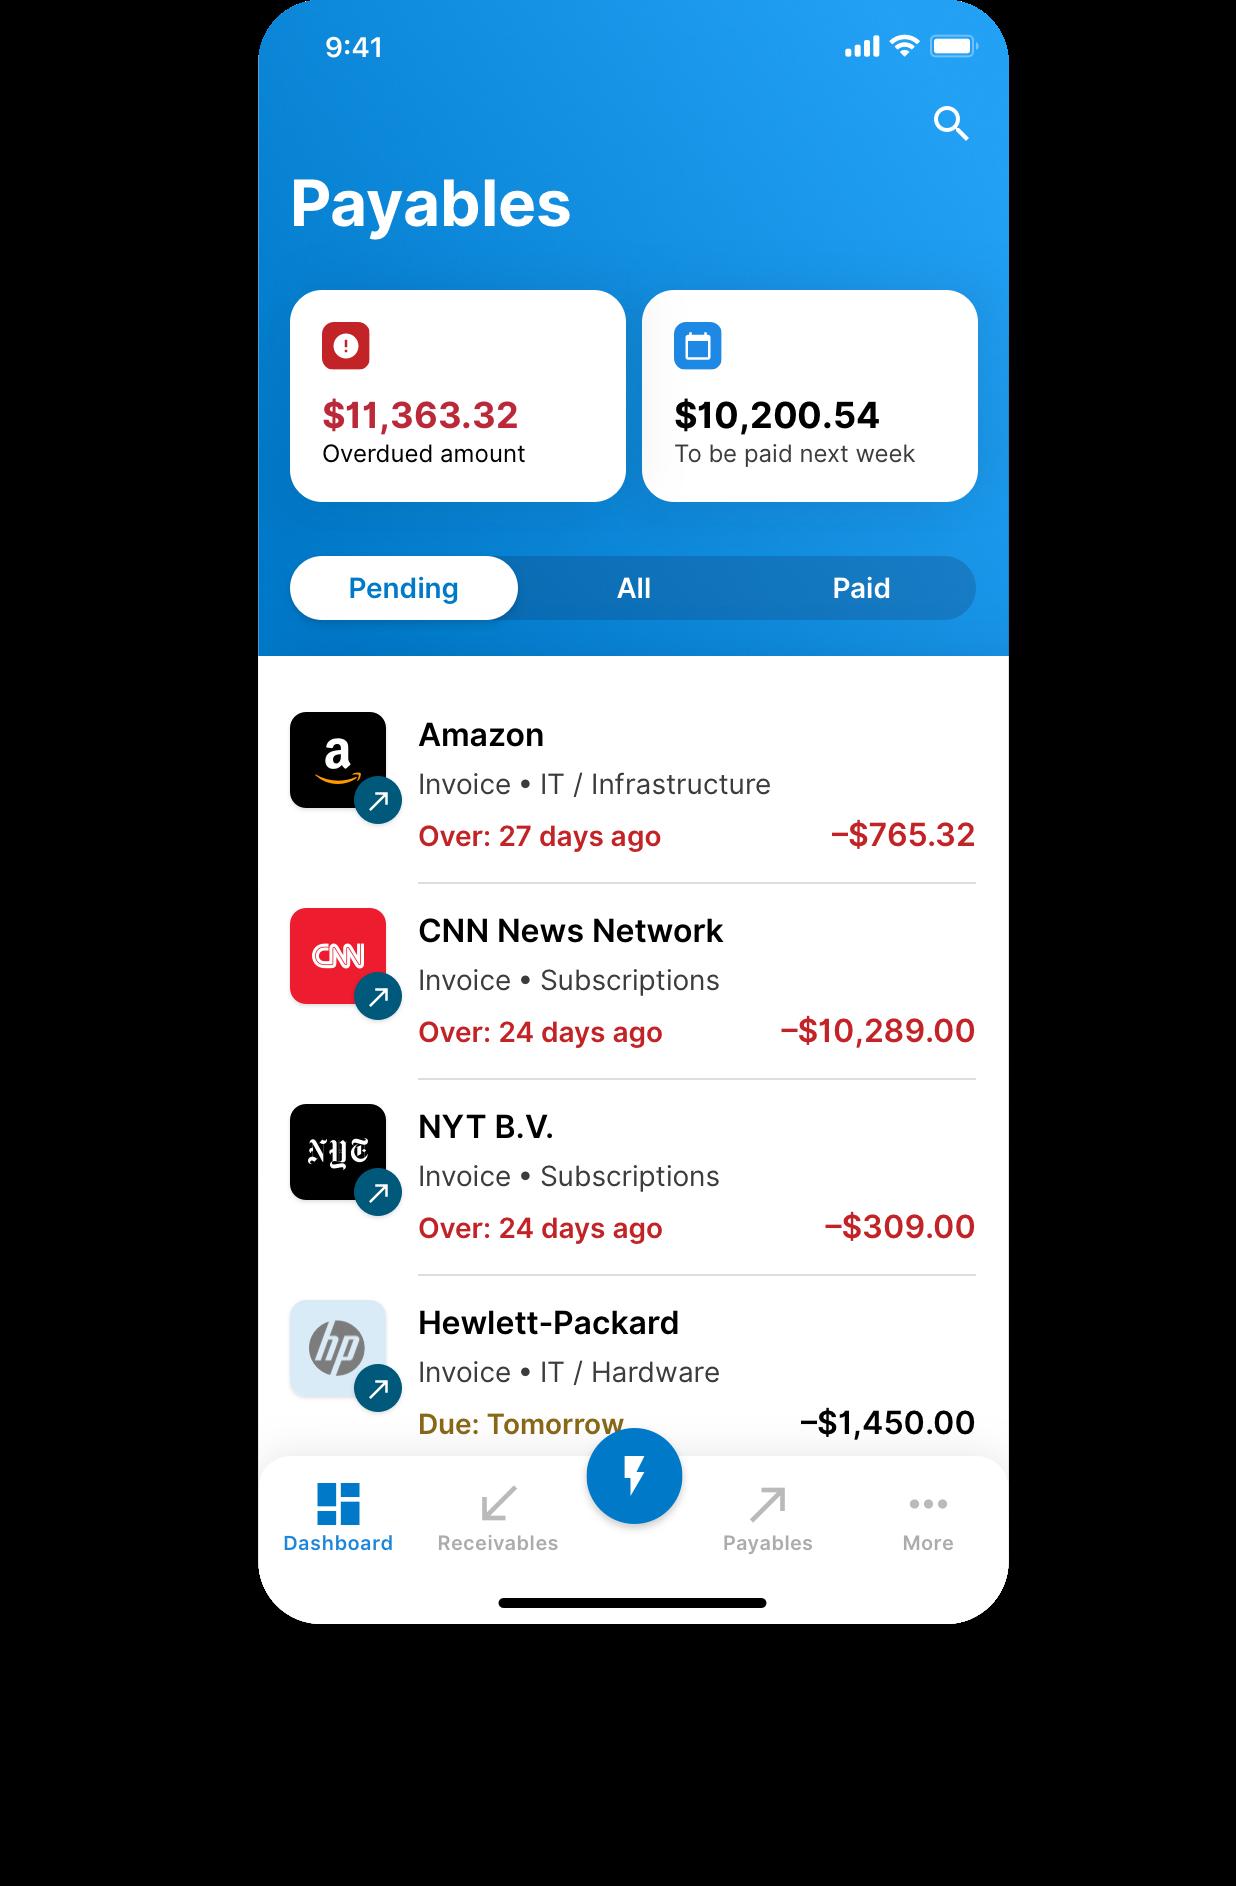 backbase-business-banking-payables-mobile6